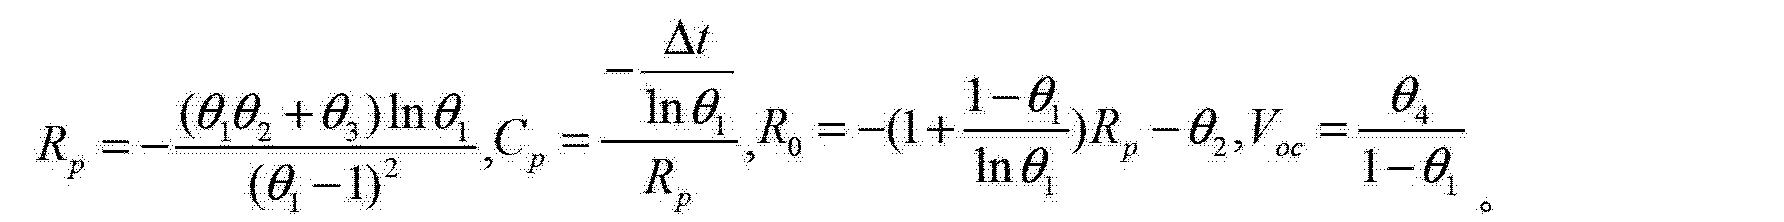 Figure CN102930173AD00052